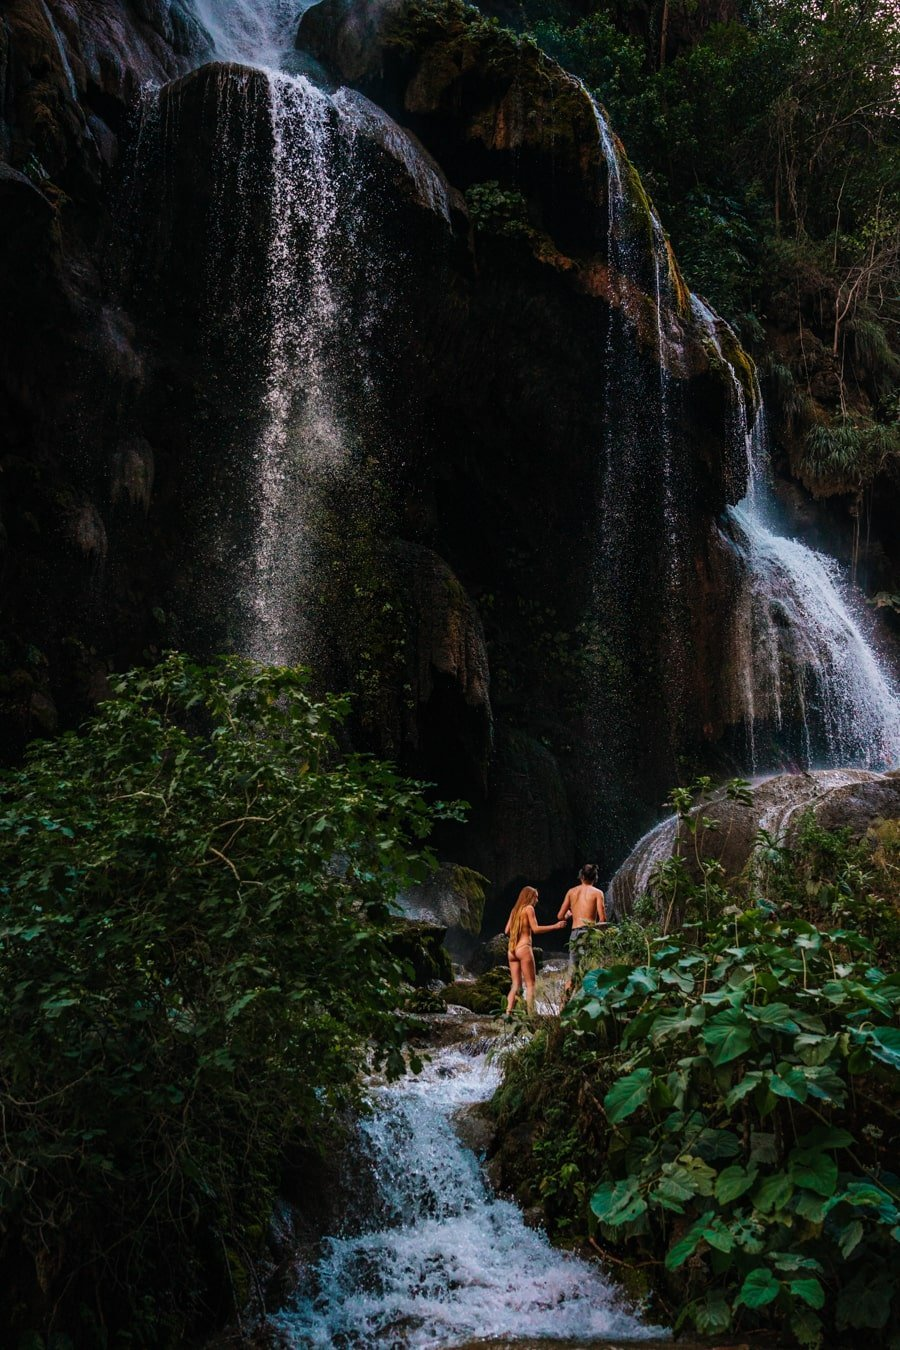 couple exploring cascada el aguacero waterfall in chiapas mexico